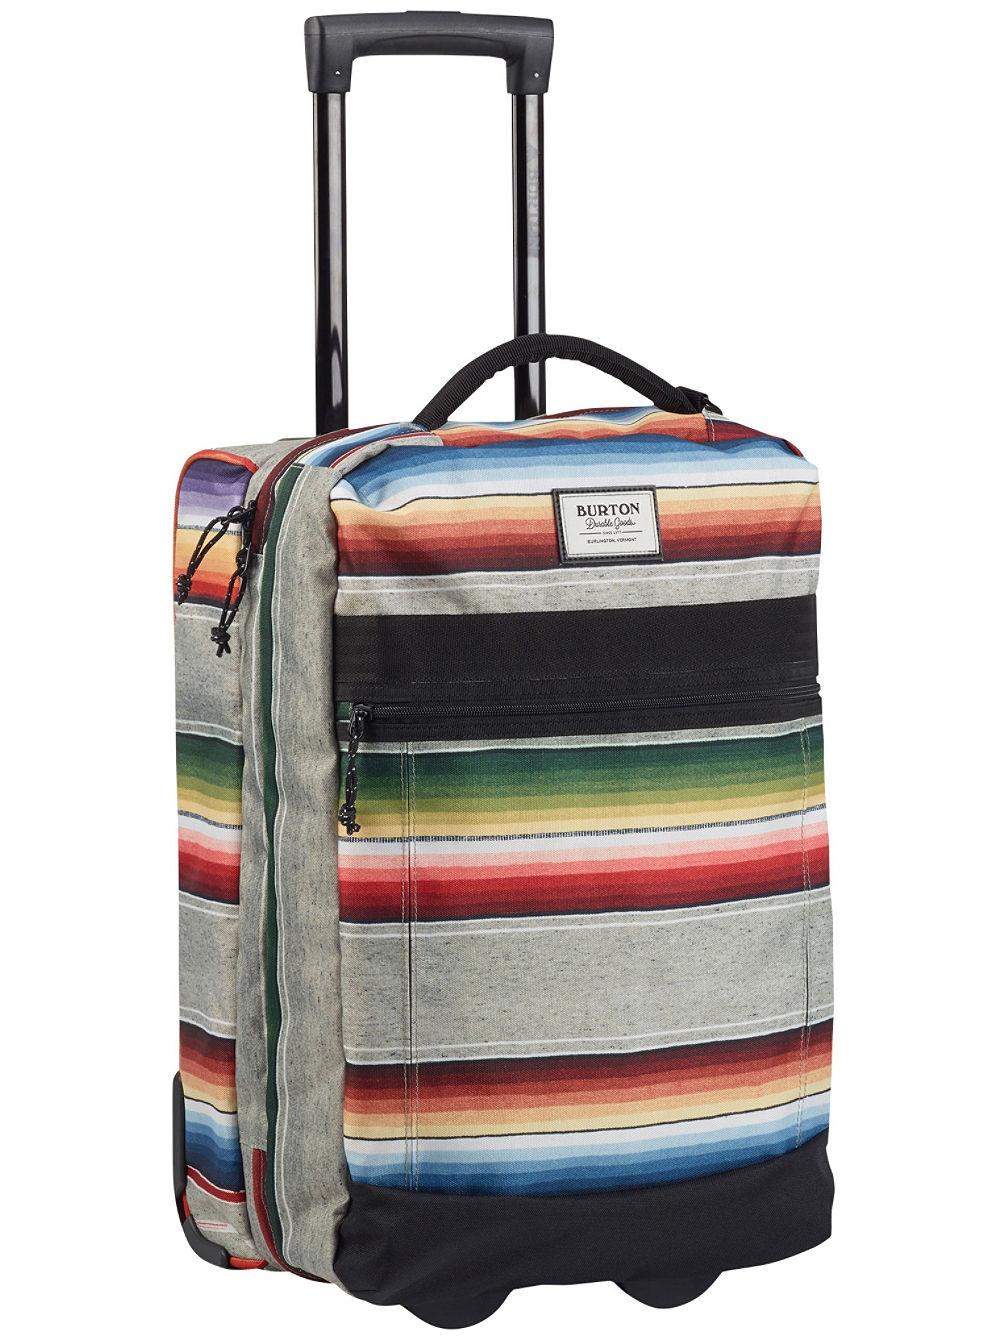 ccca88bbf9 Overnighter Roller Travel Bag